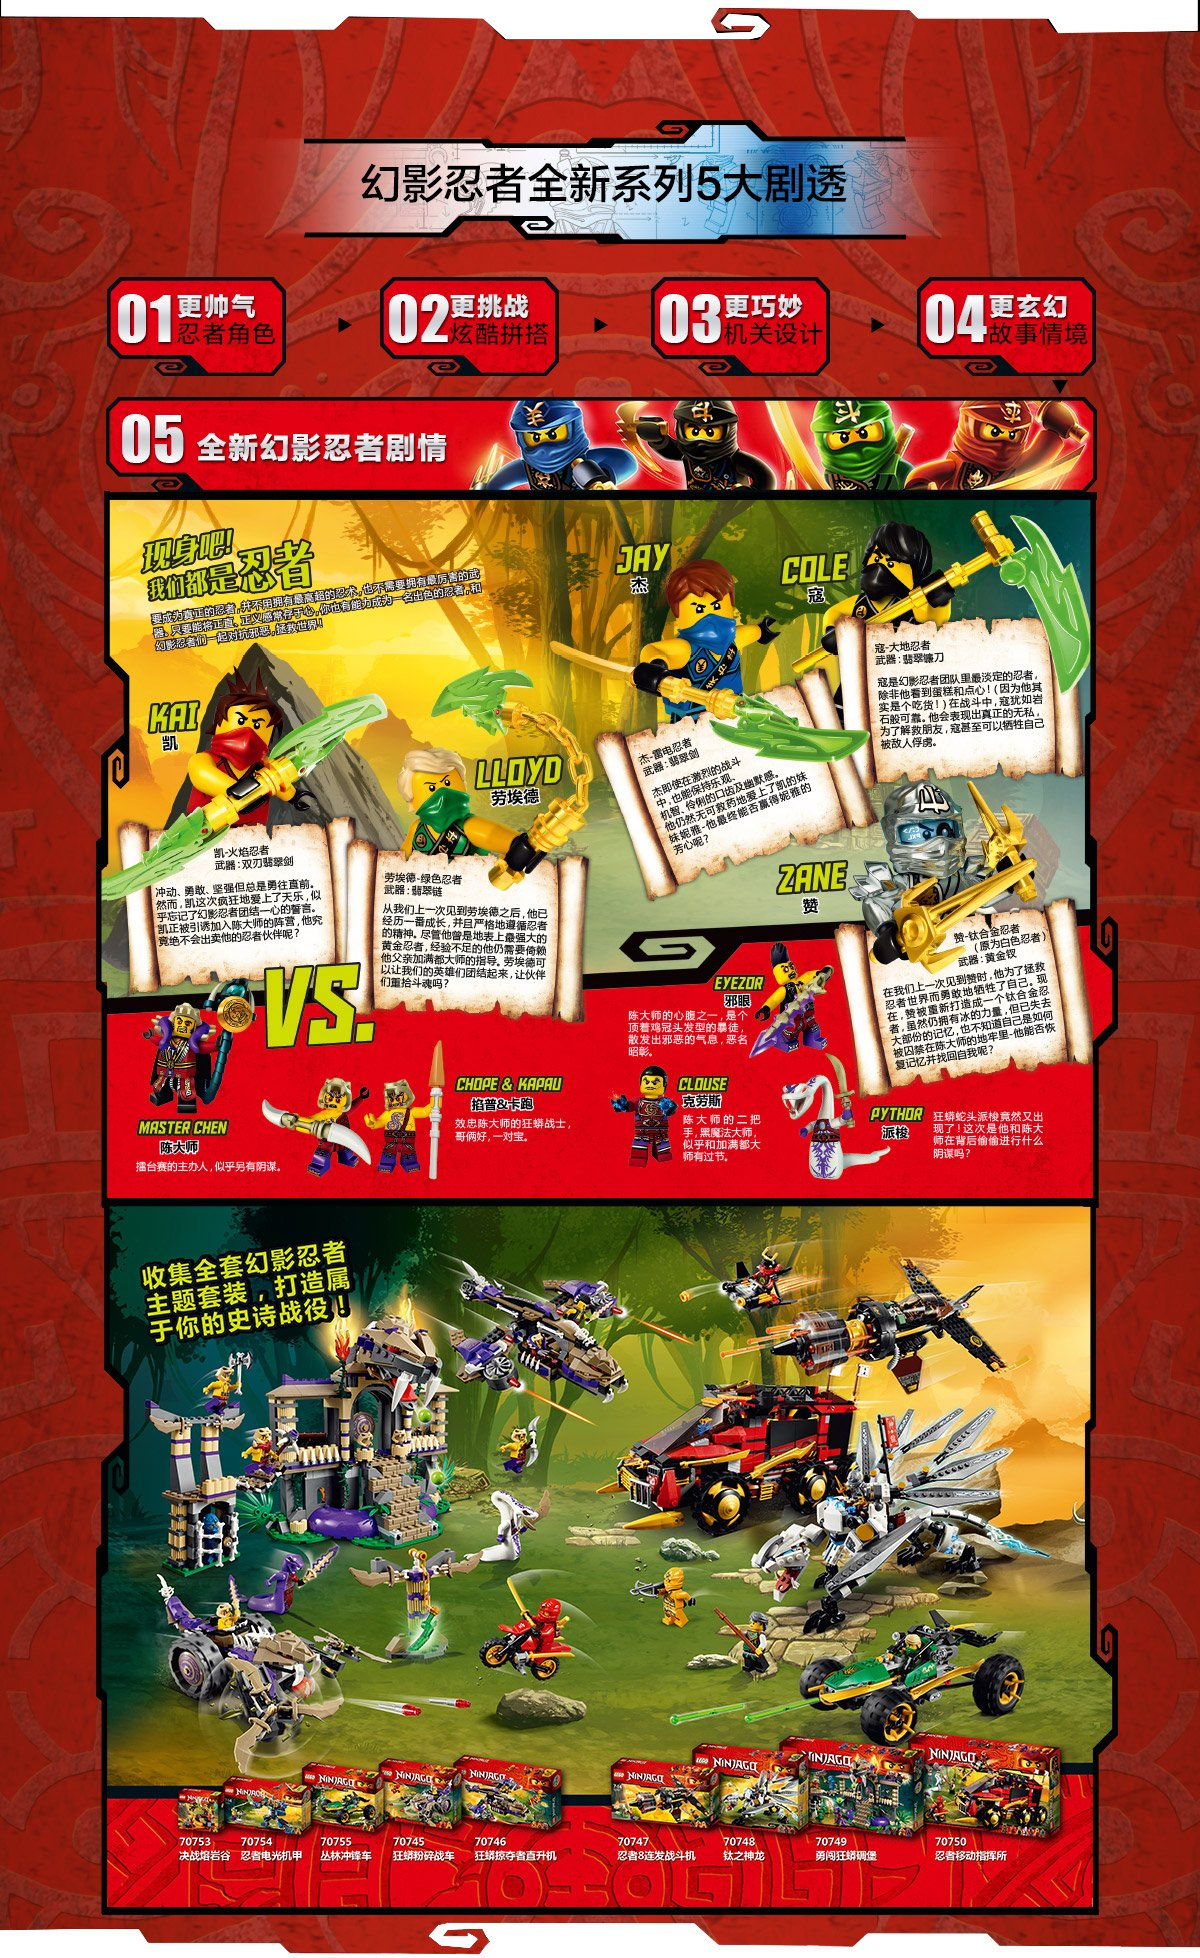 lego乐高幻影忍者 - 玩具